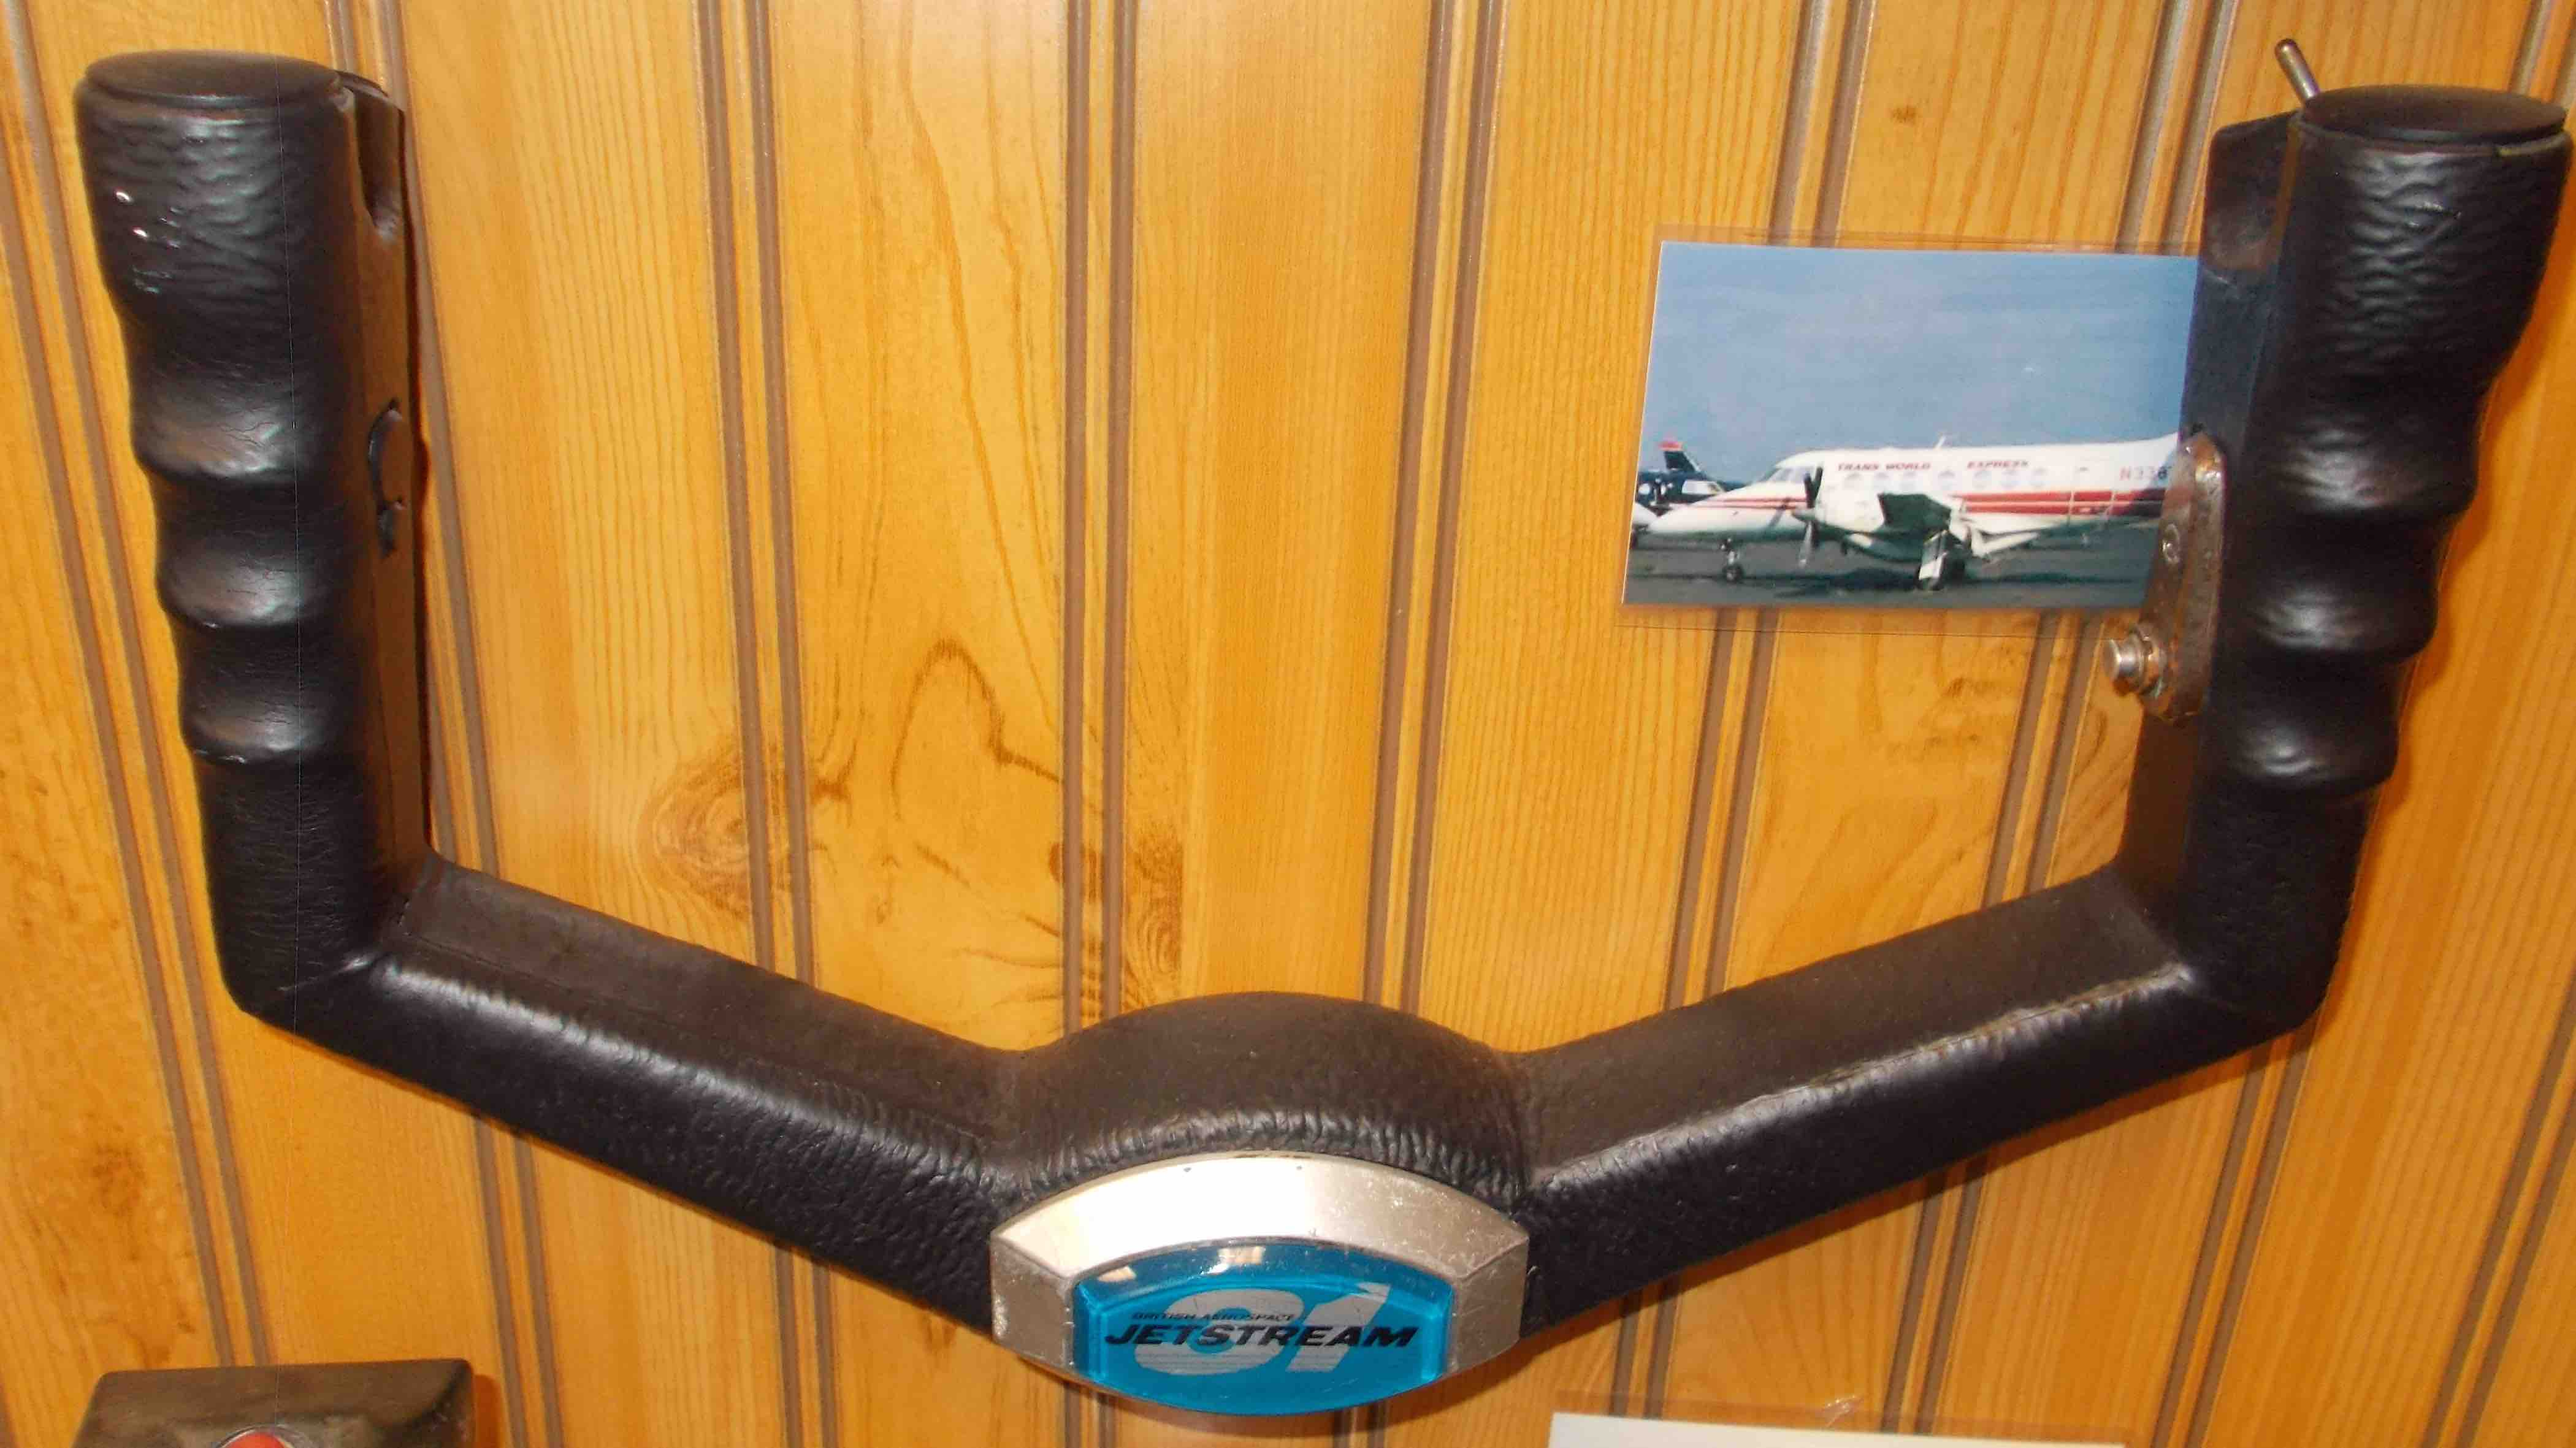 Jetstream 31